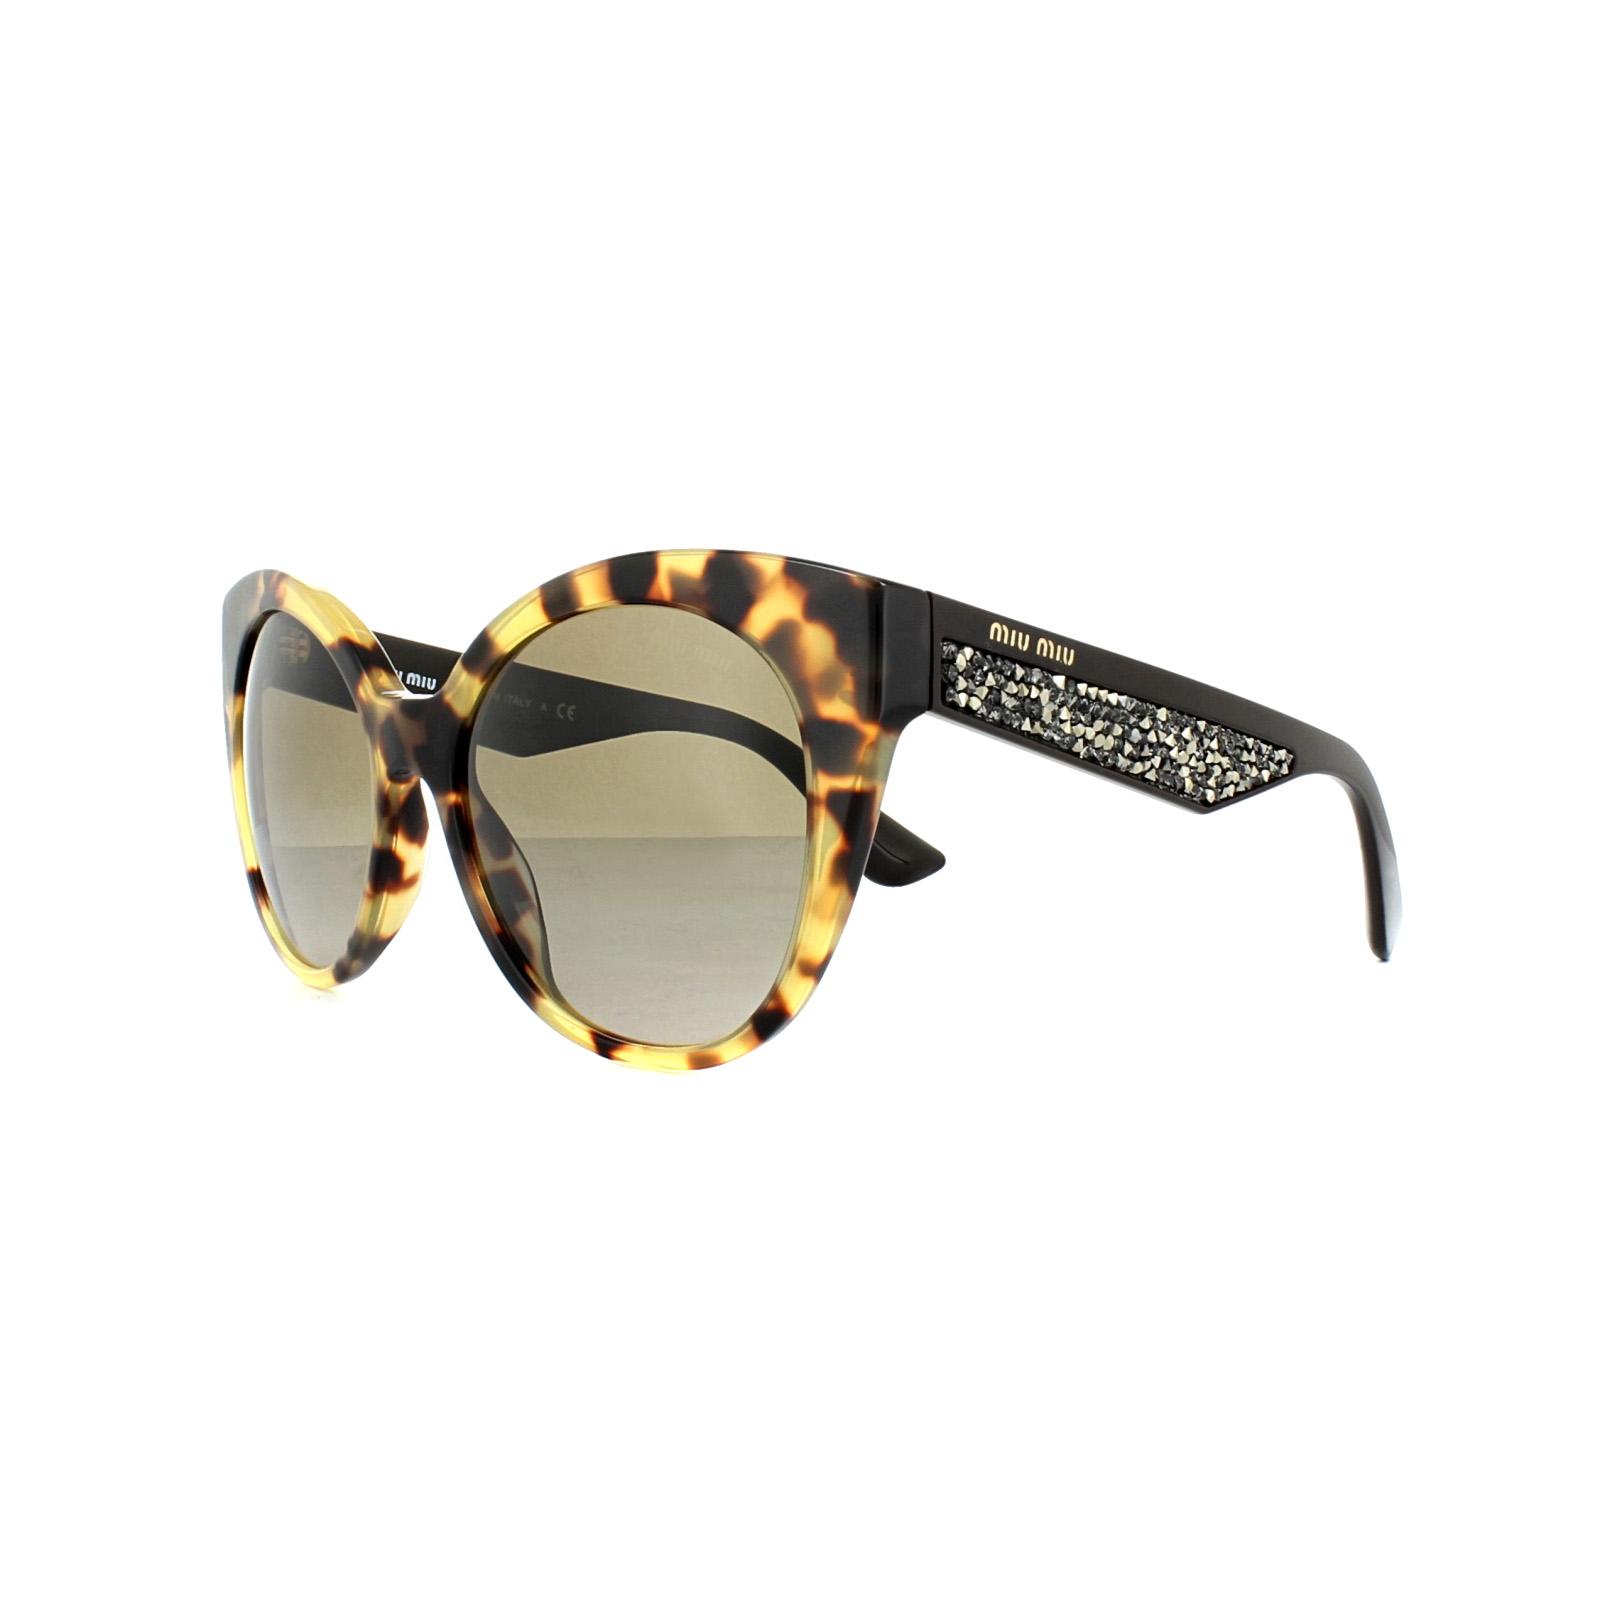 5495cb7fe Cheap Miu Miu 07RS Sunglasses - Discounted Sunglasses